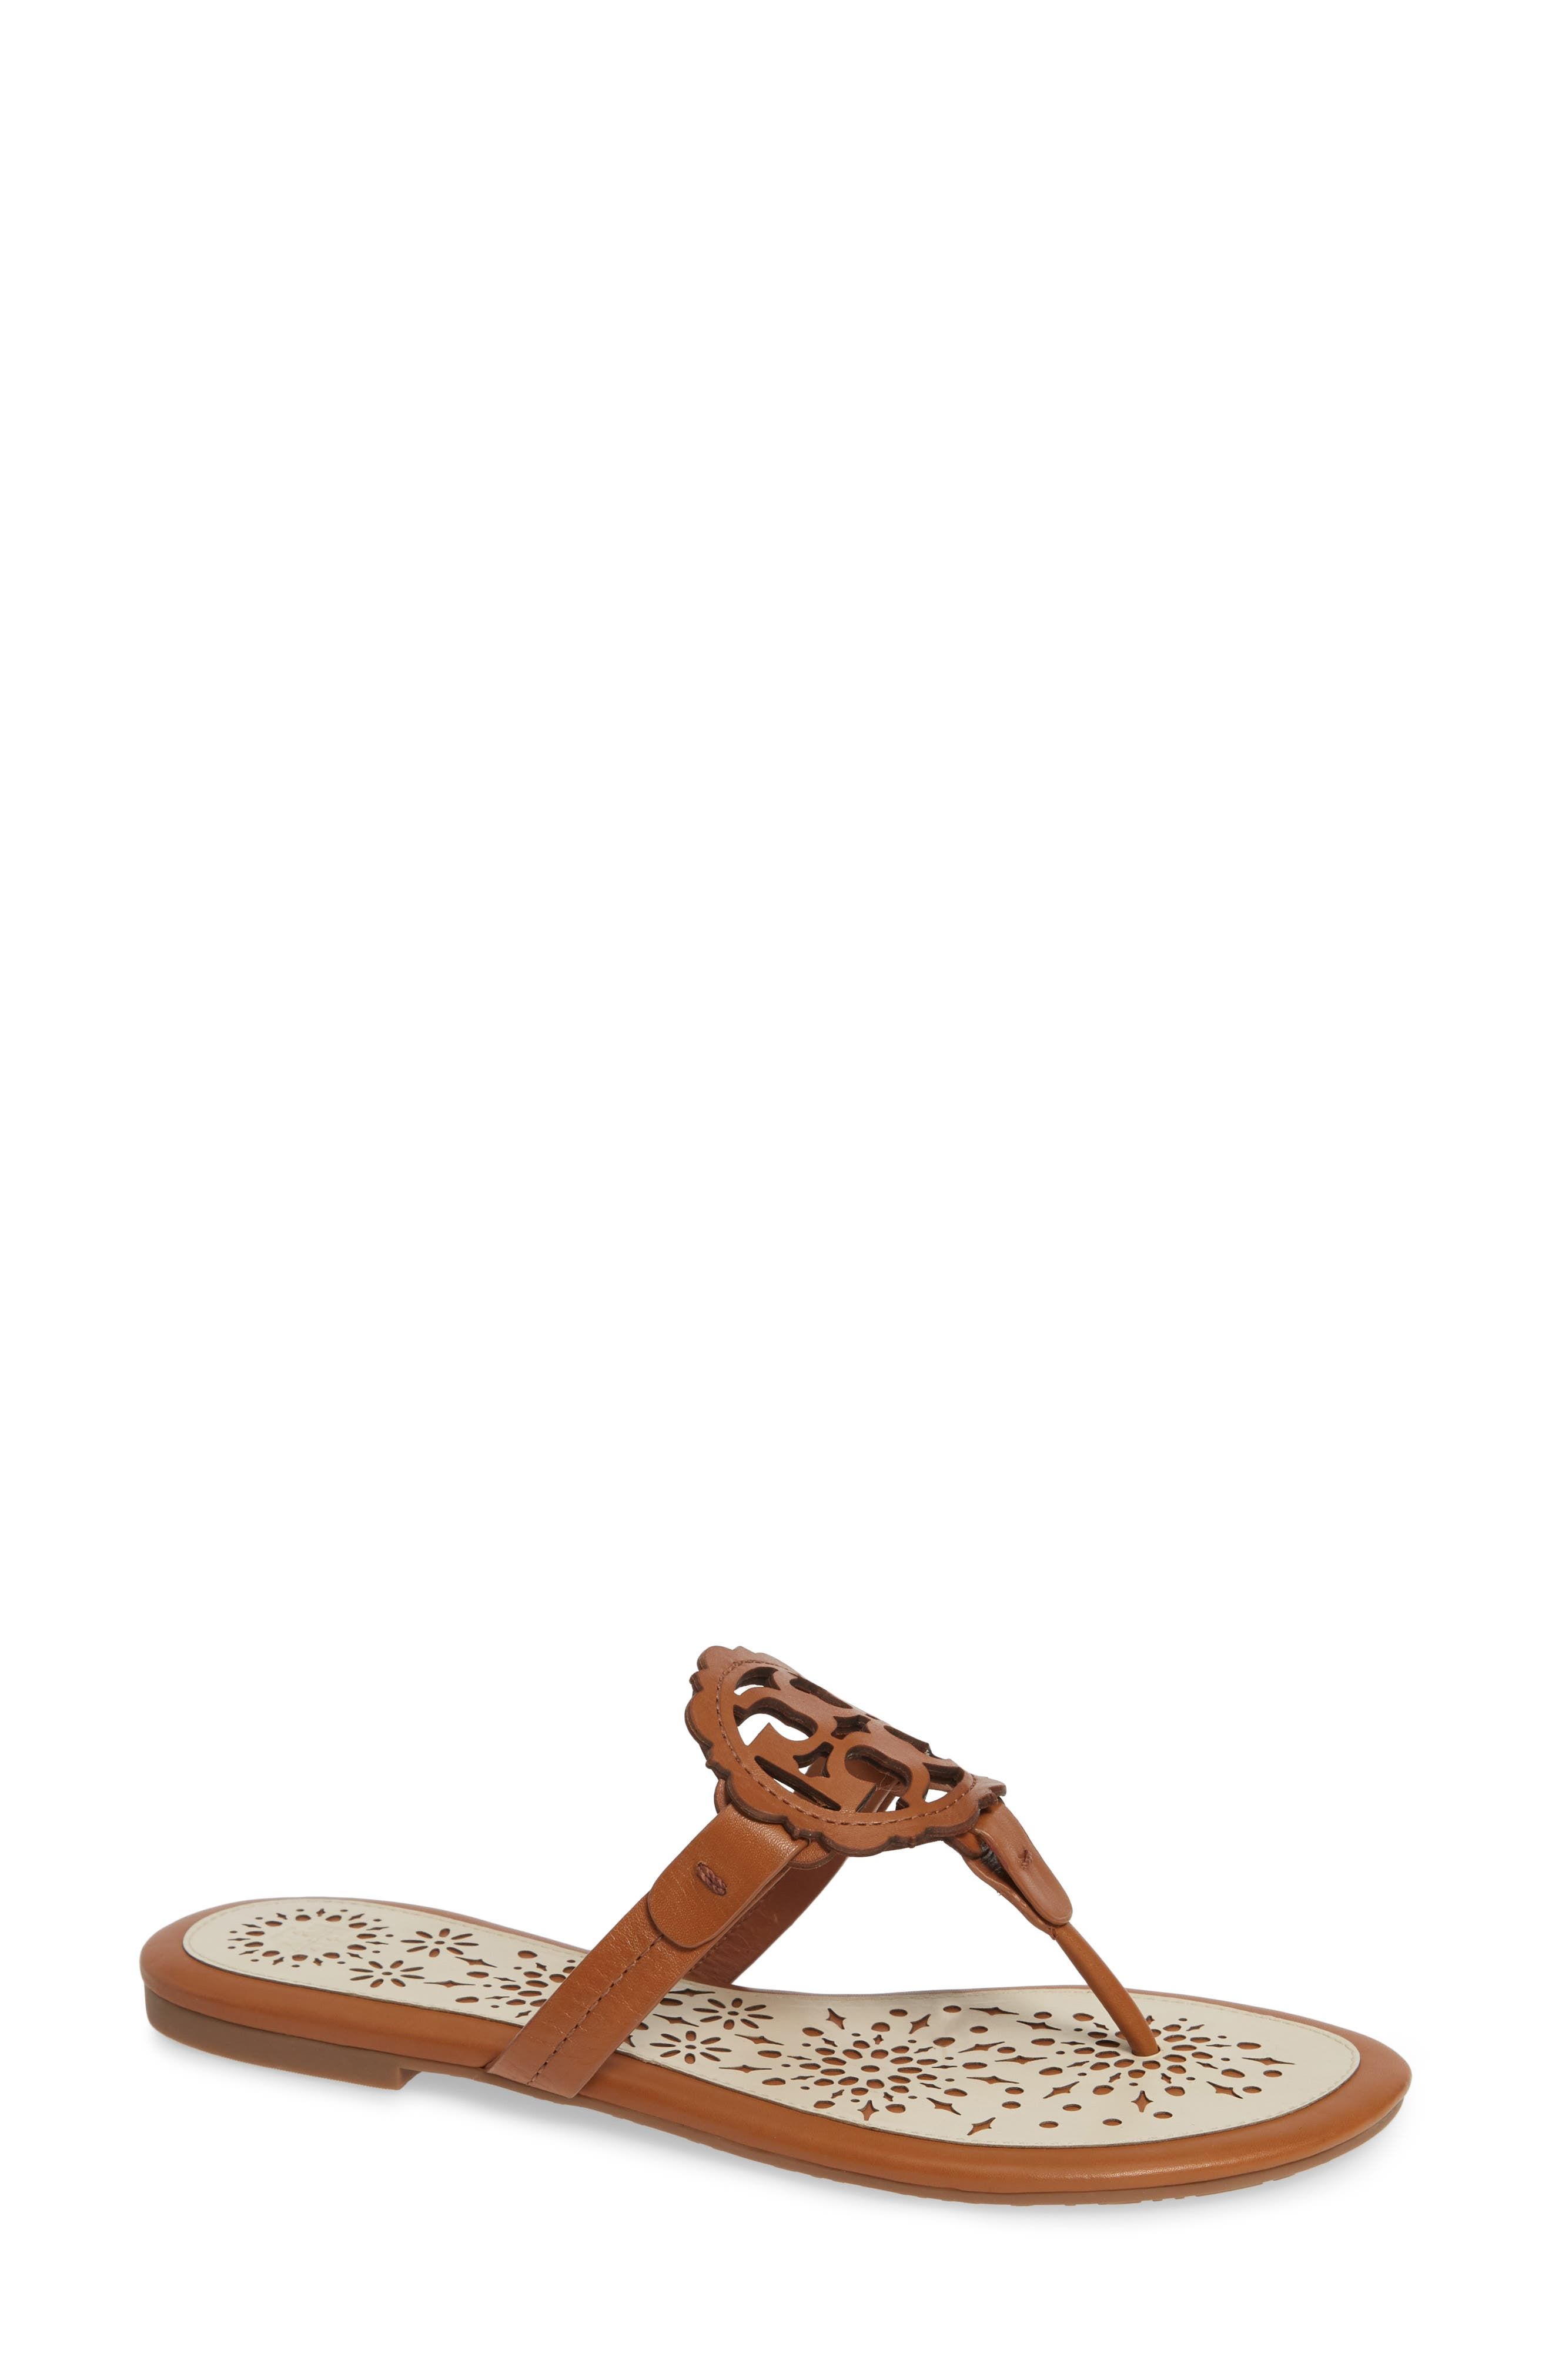 TORY BURCH, Miller Scalloped Medallion Sandal, Main thumbnail 1, color, TAN/ NEW CREAM